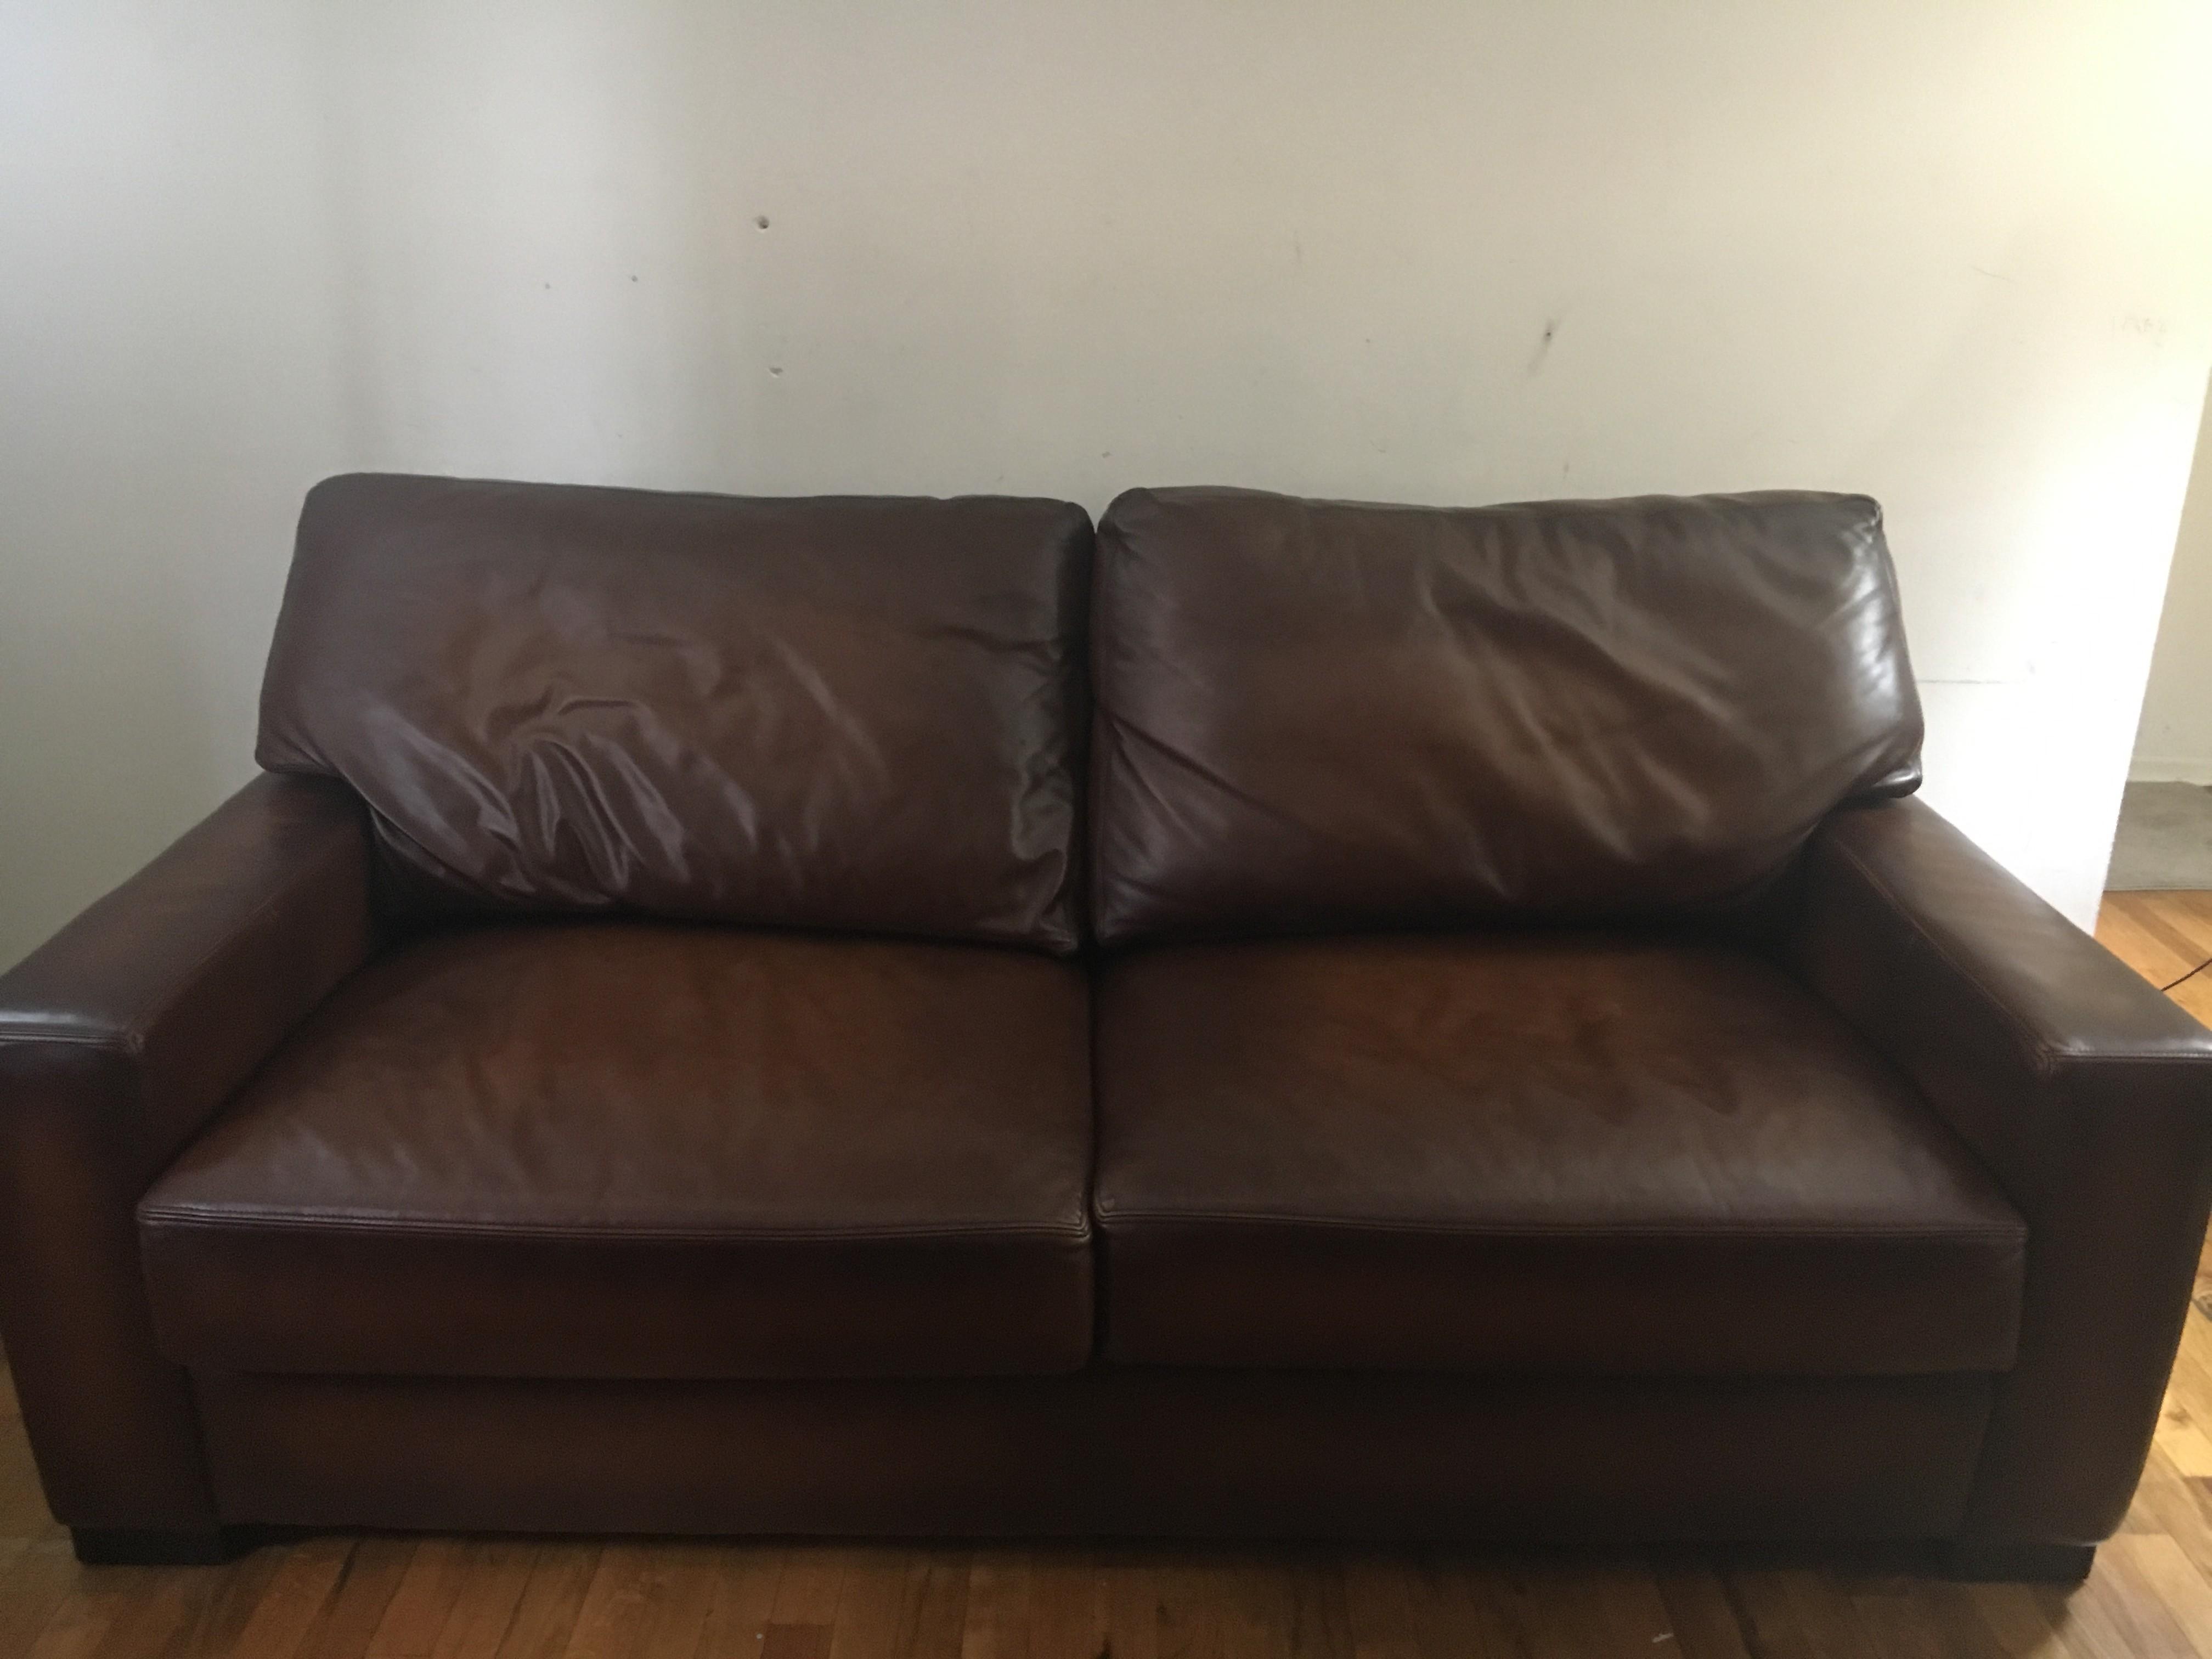 Pottery Barn Leather Sofa in Dark Brown